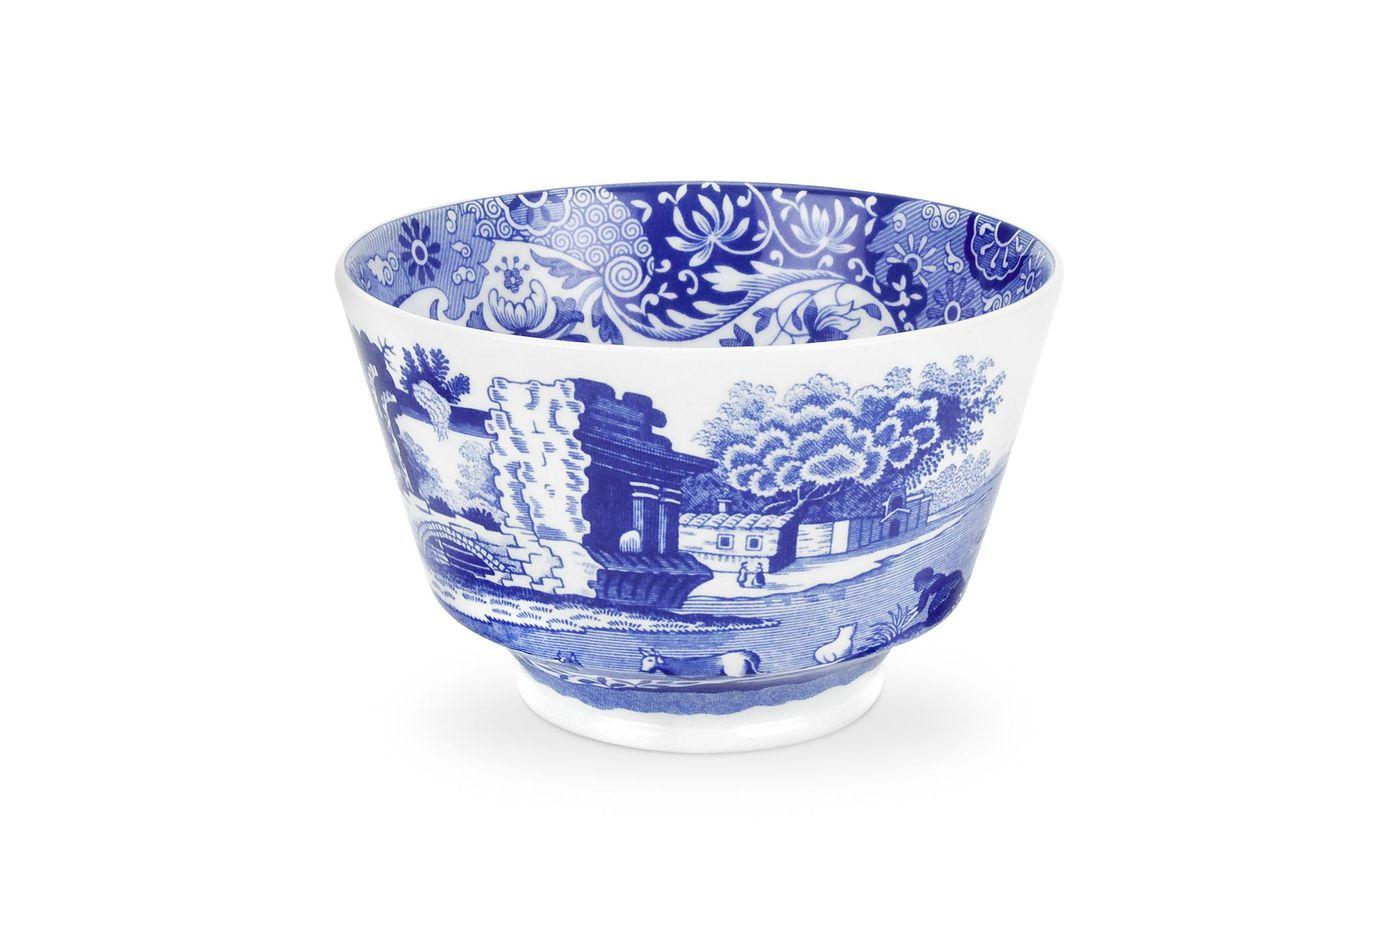 "Spode Blue Italian Sugar Bowl - Open (Tea) 4 1/4"" thumb 1"